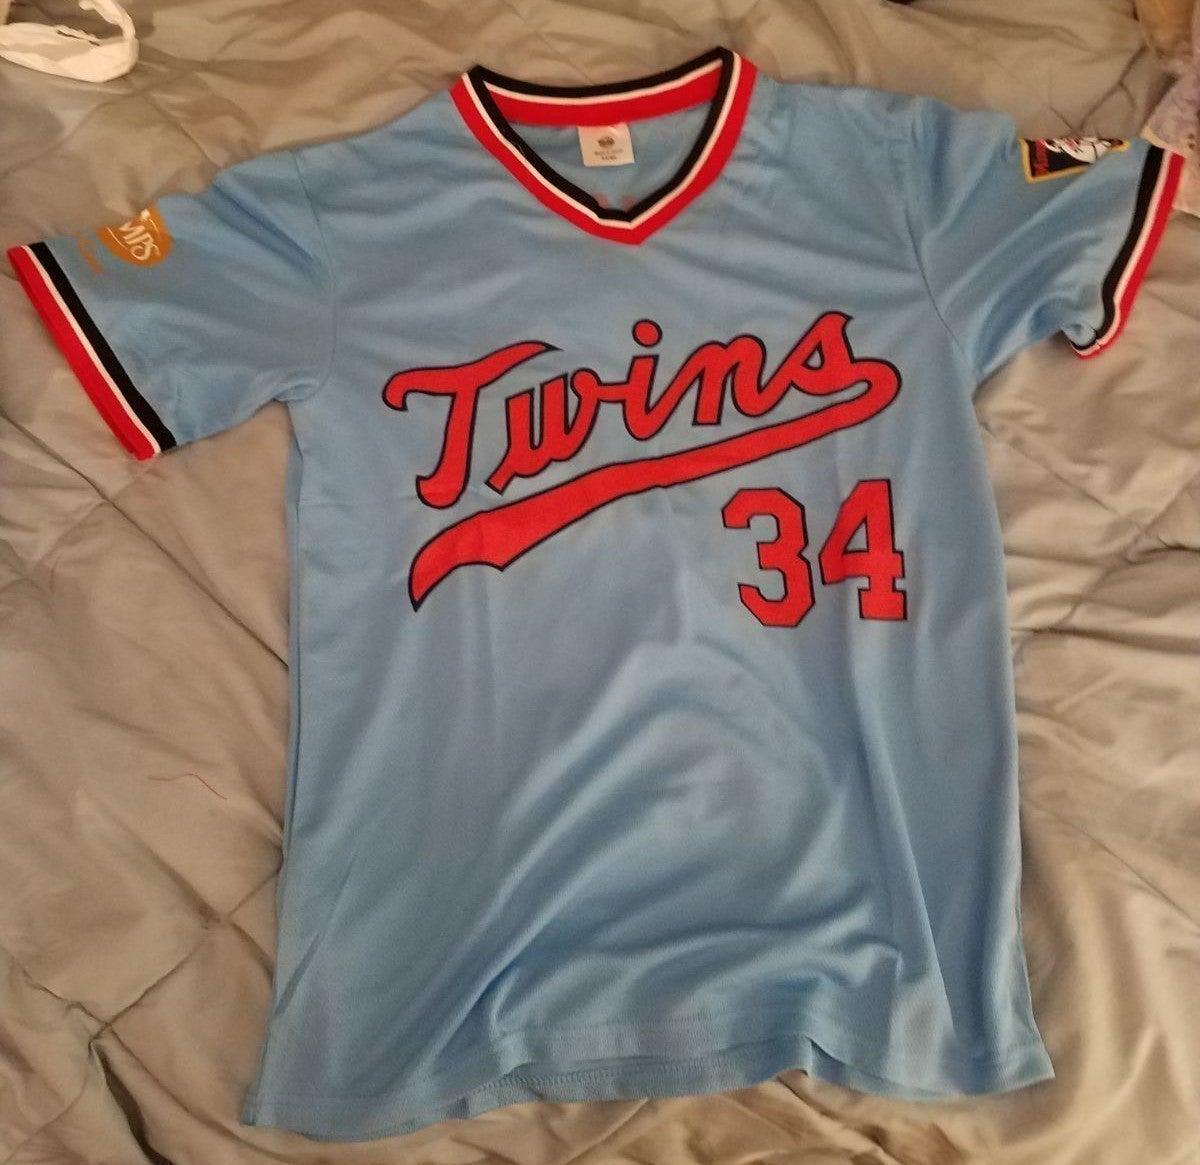 Twins 34 Puckett Jersey